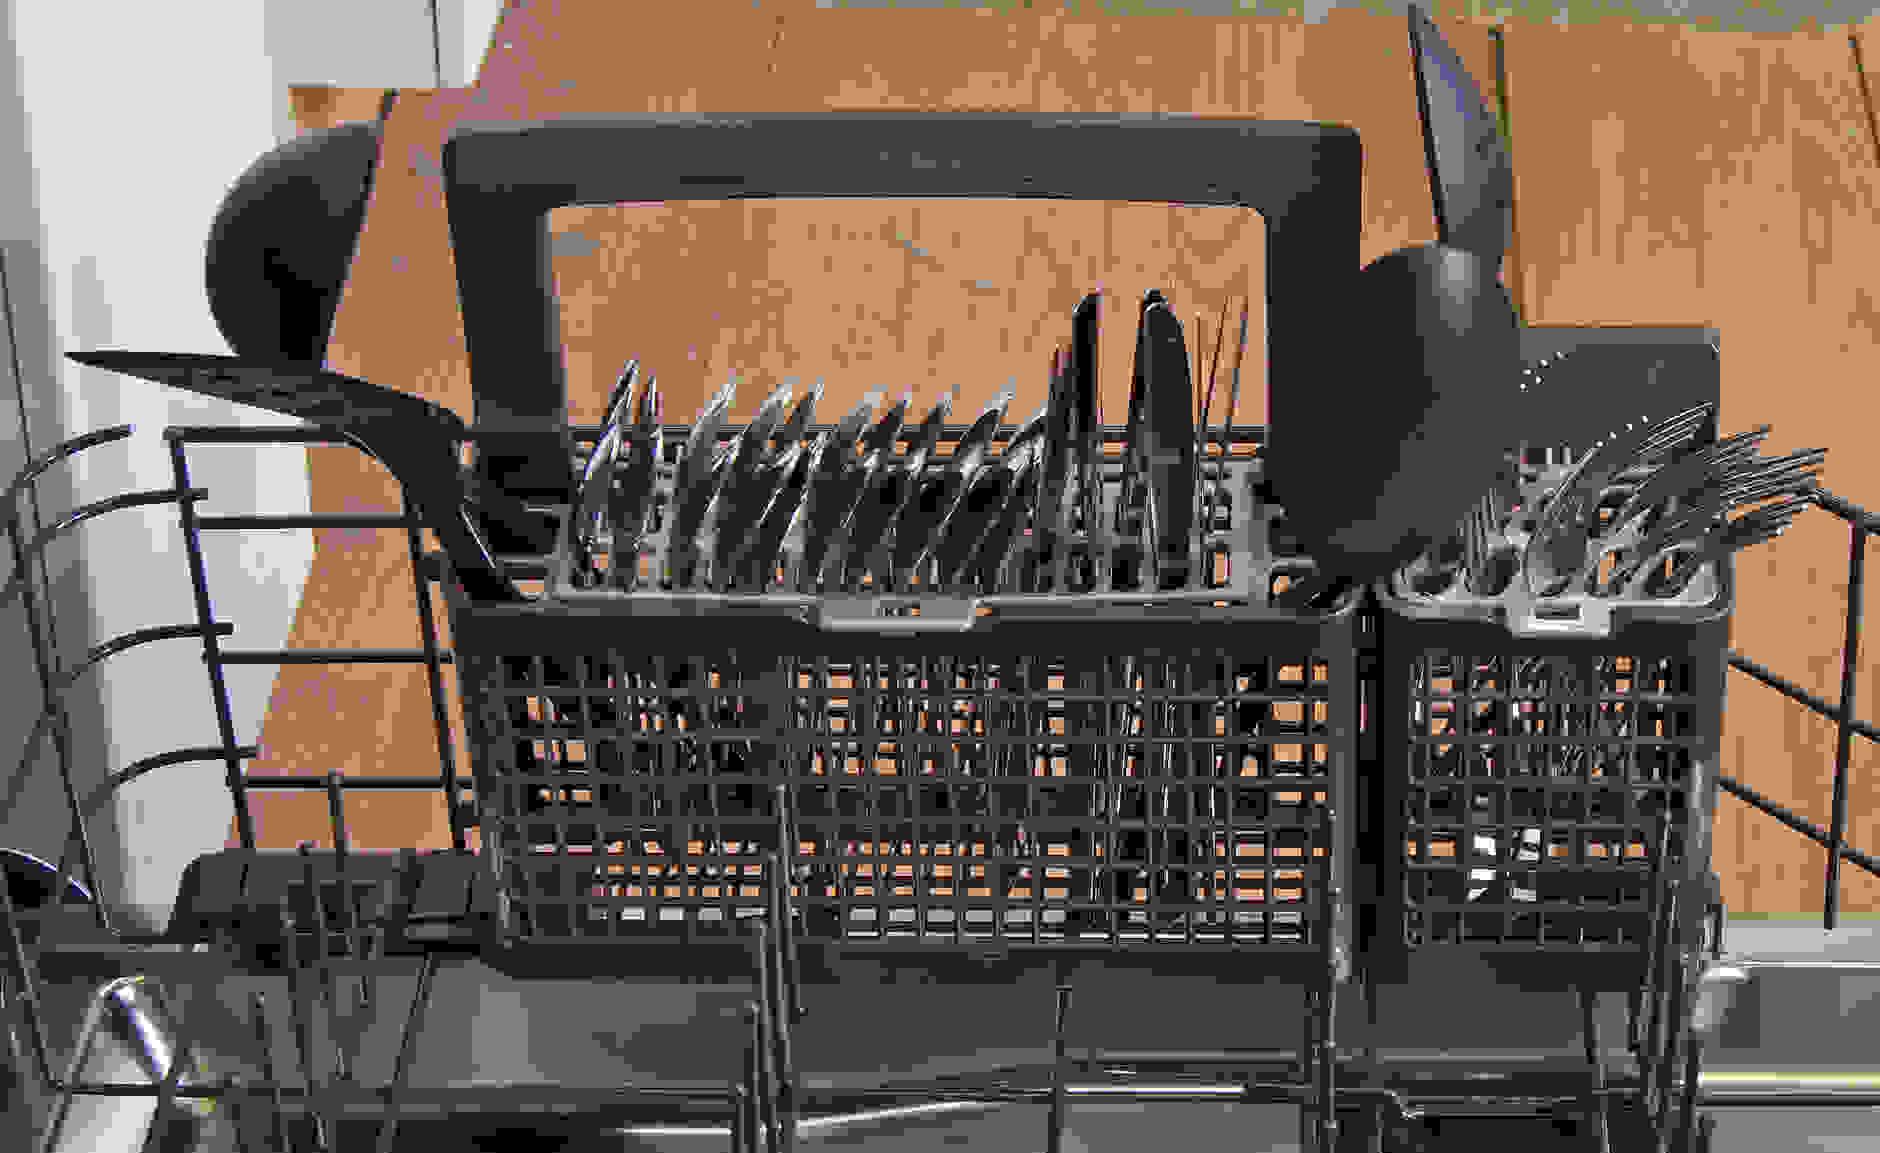 GE Monogram ZDT800SSFSS cutlery basket capacity